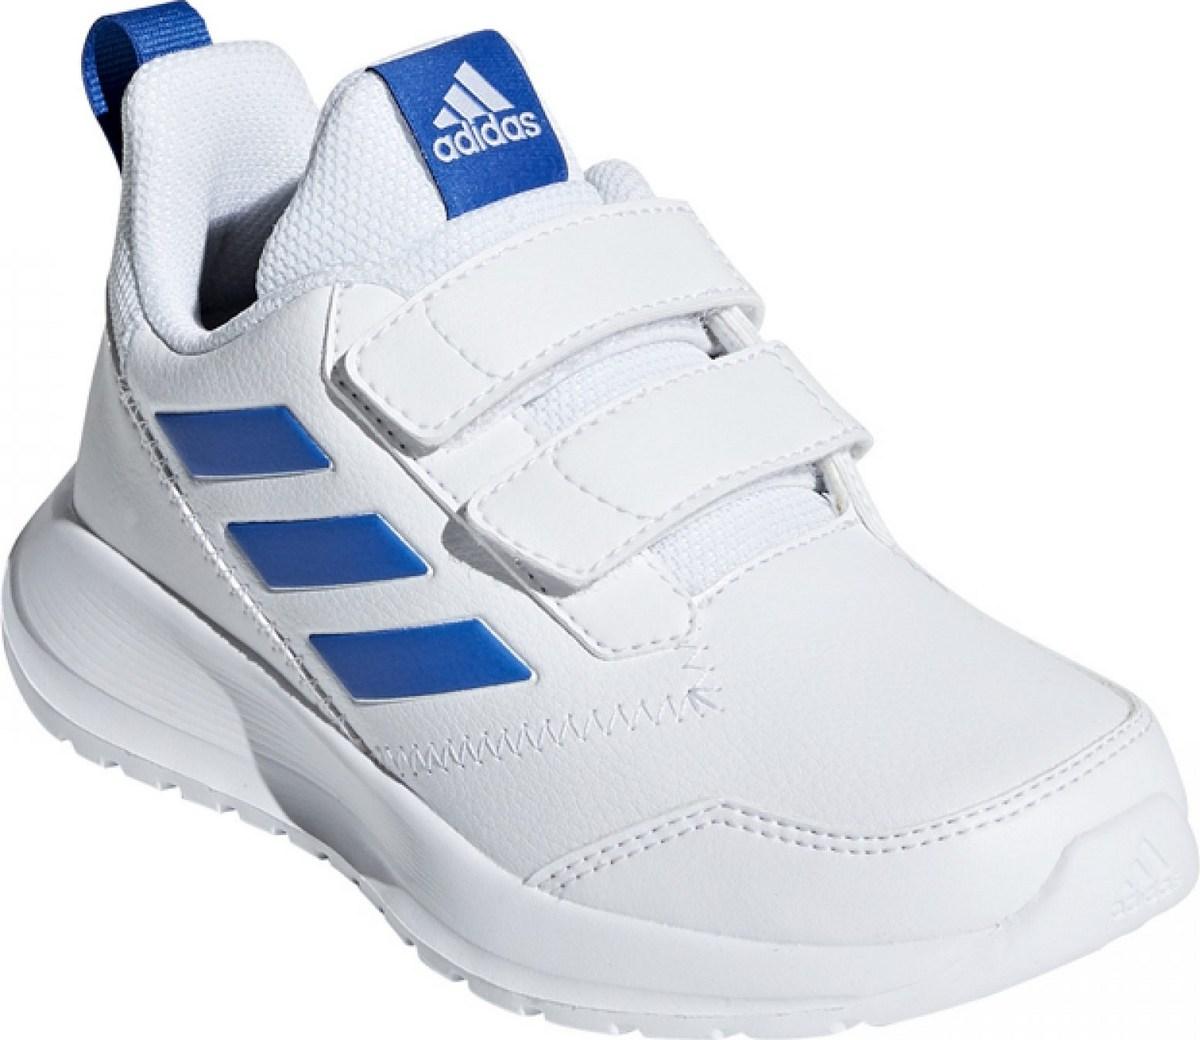 Adidas AltaRun CF K CM8587